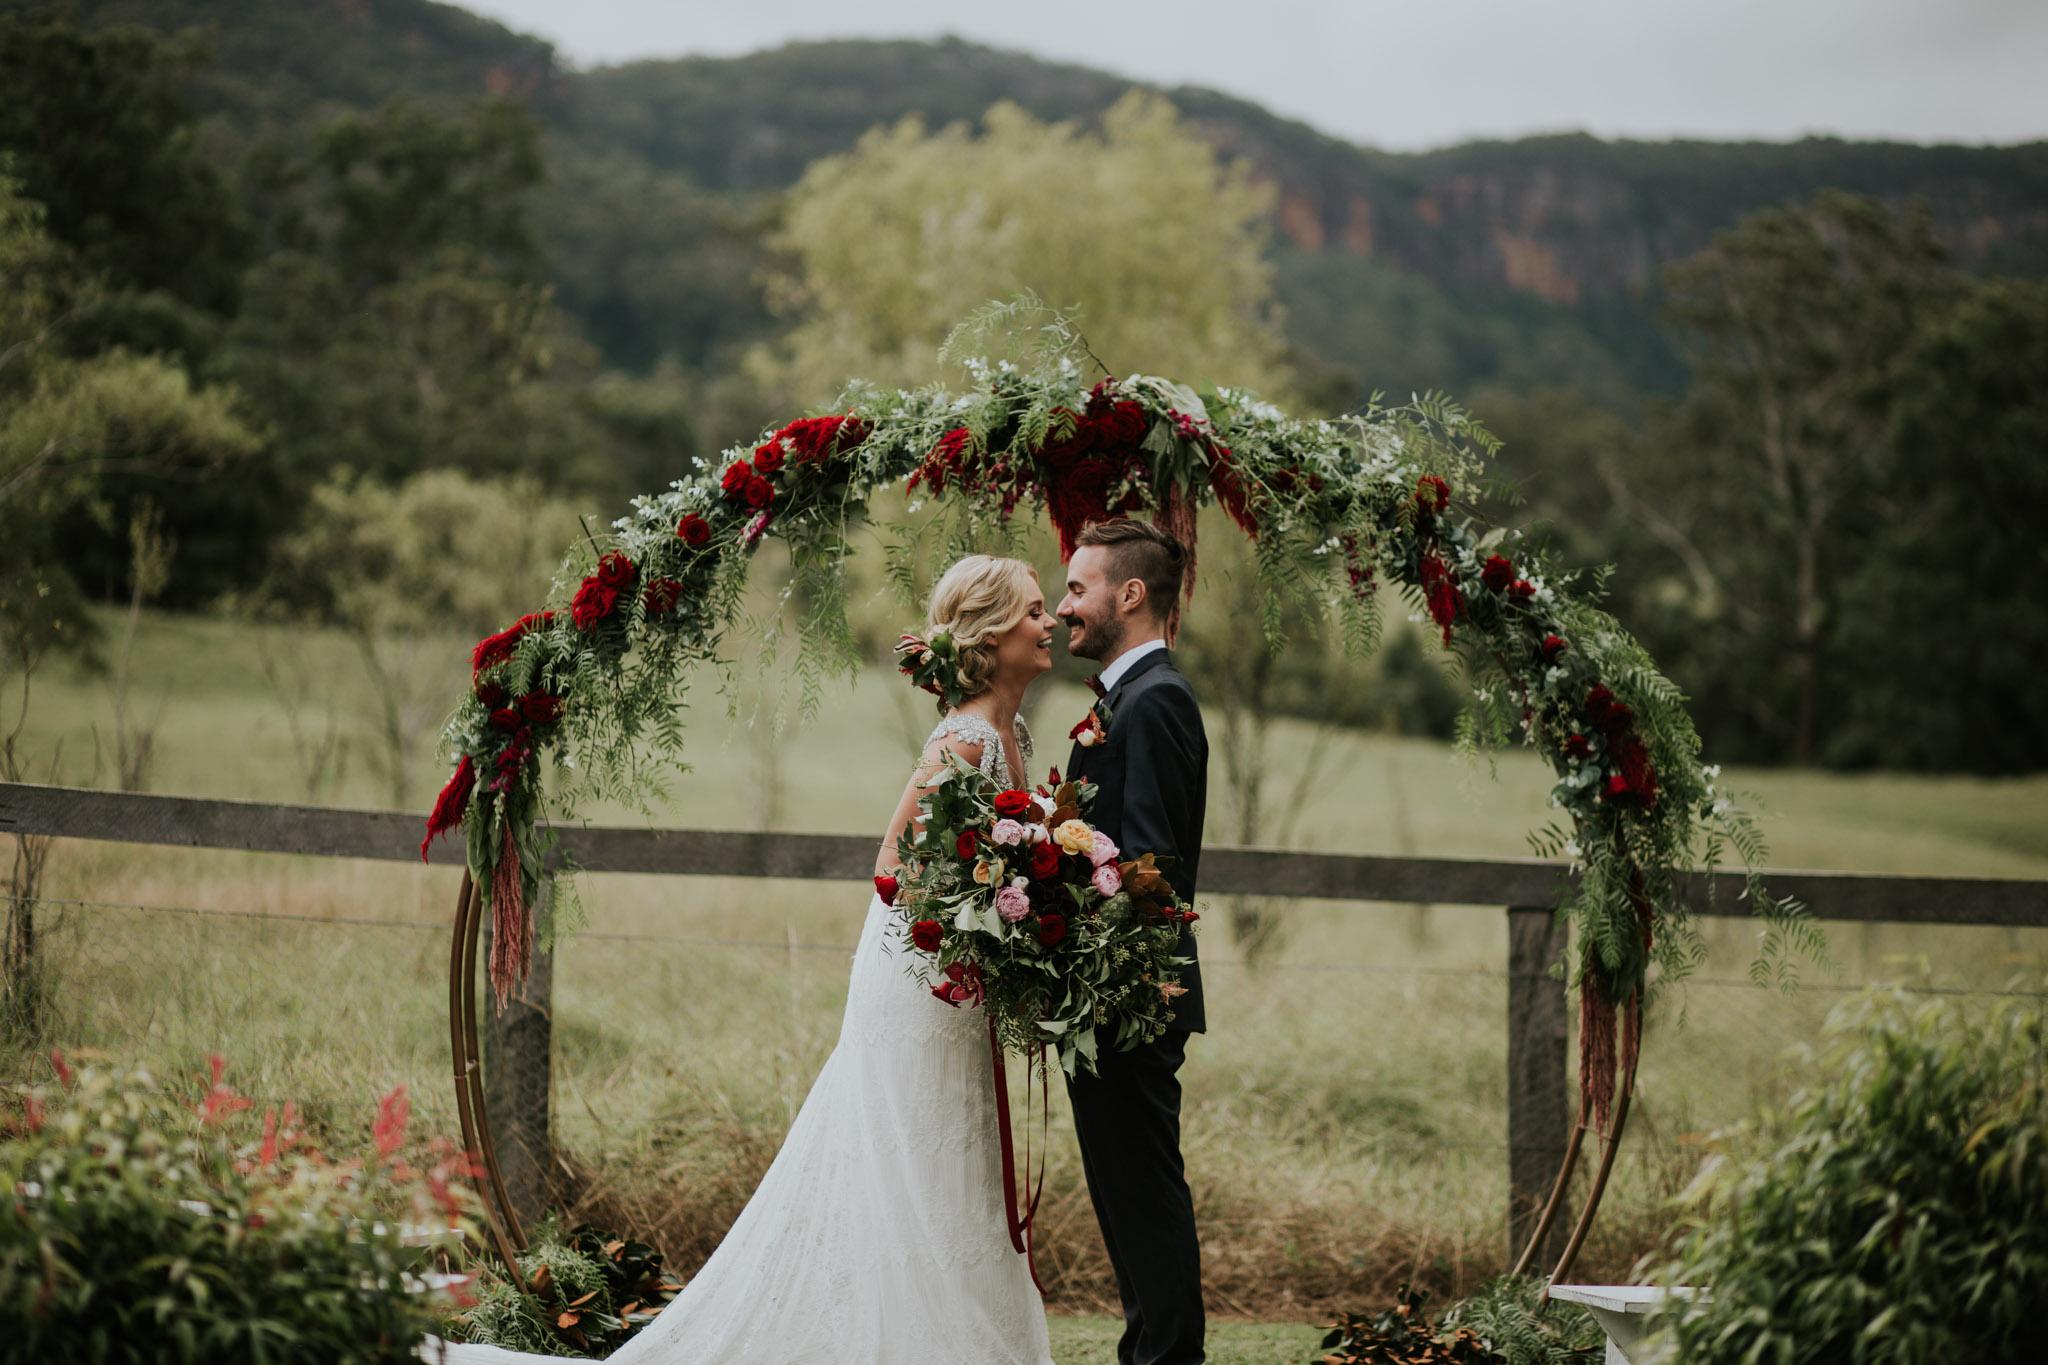 SPRING-GROVE-DAIRY-WEDDING-64.jpg